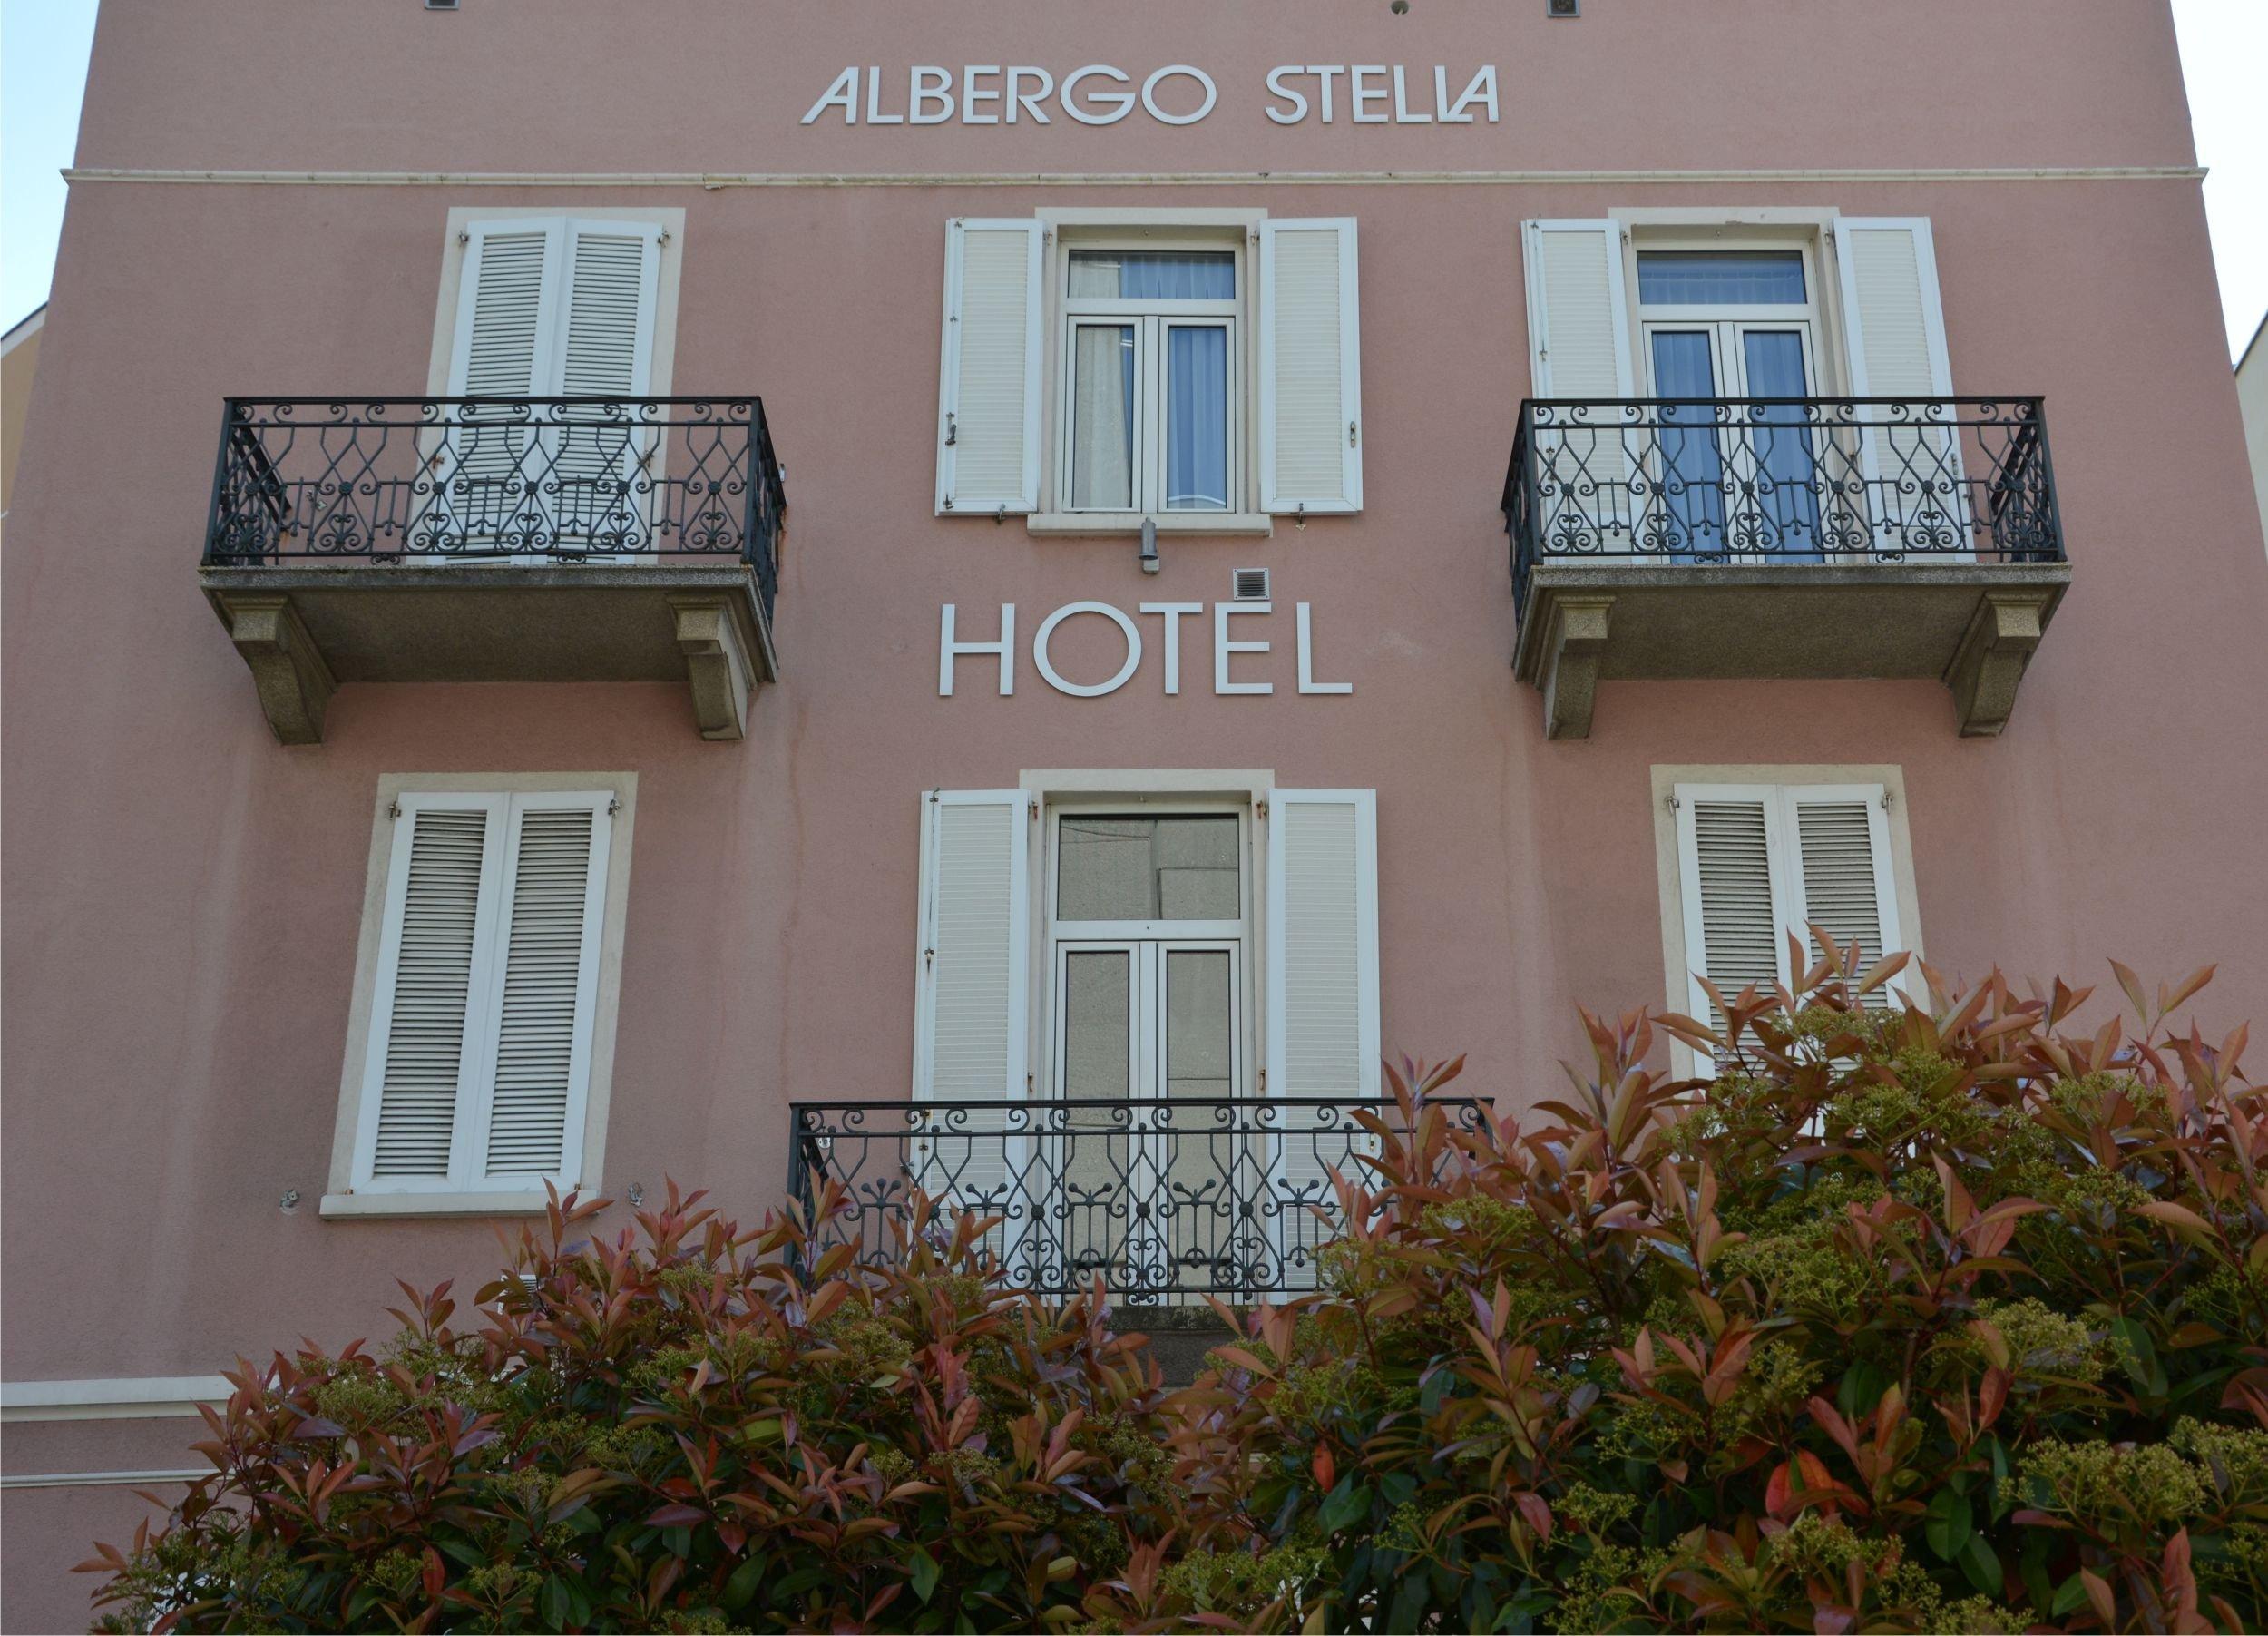 Albergo Stella